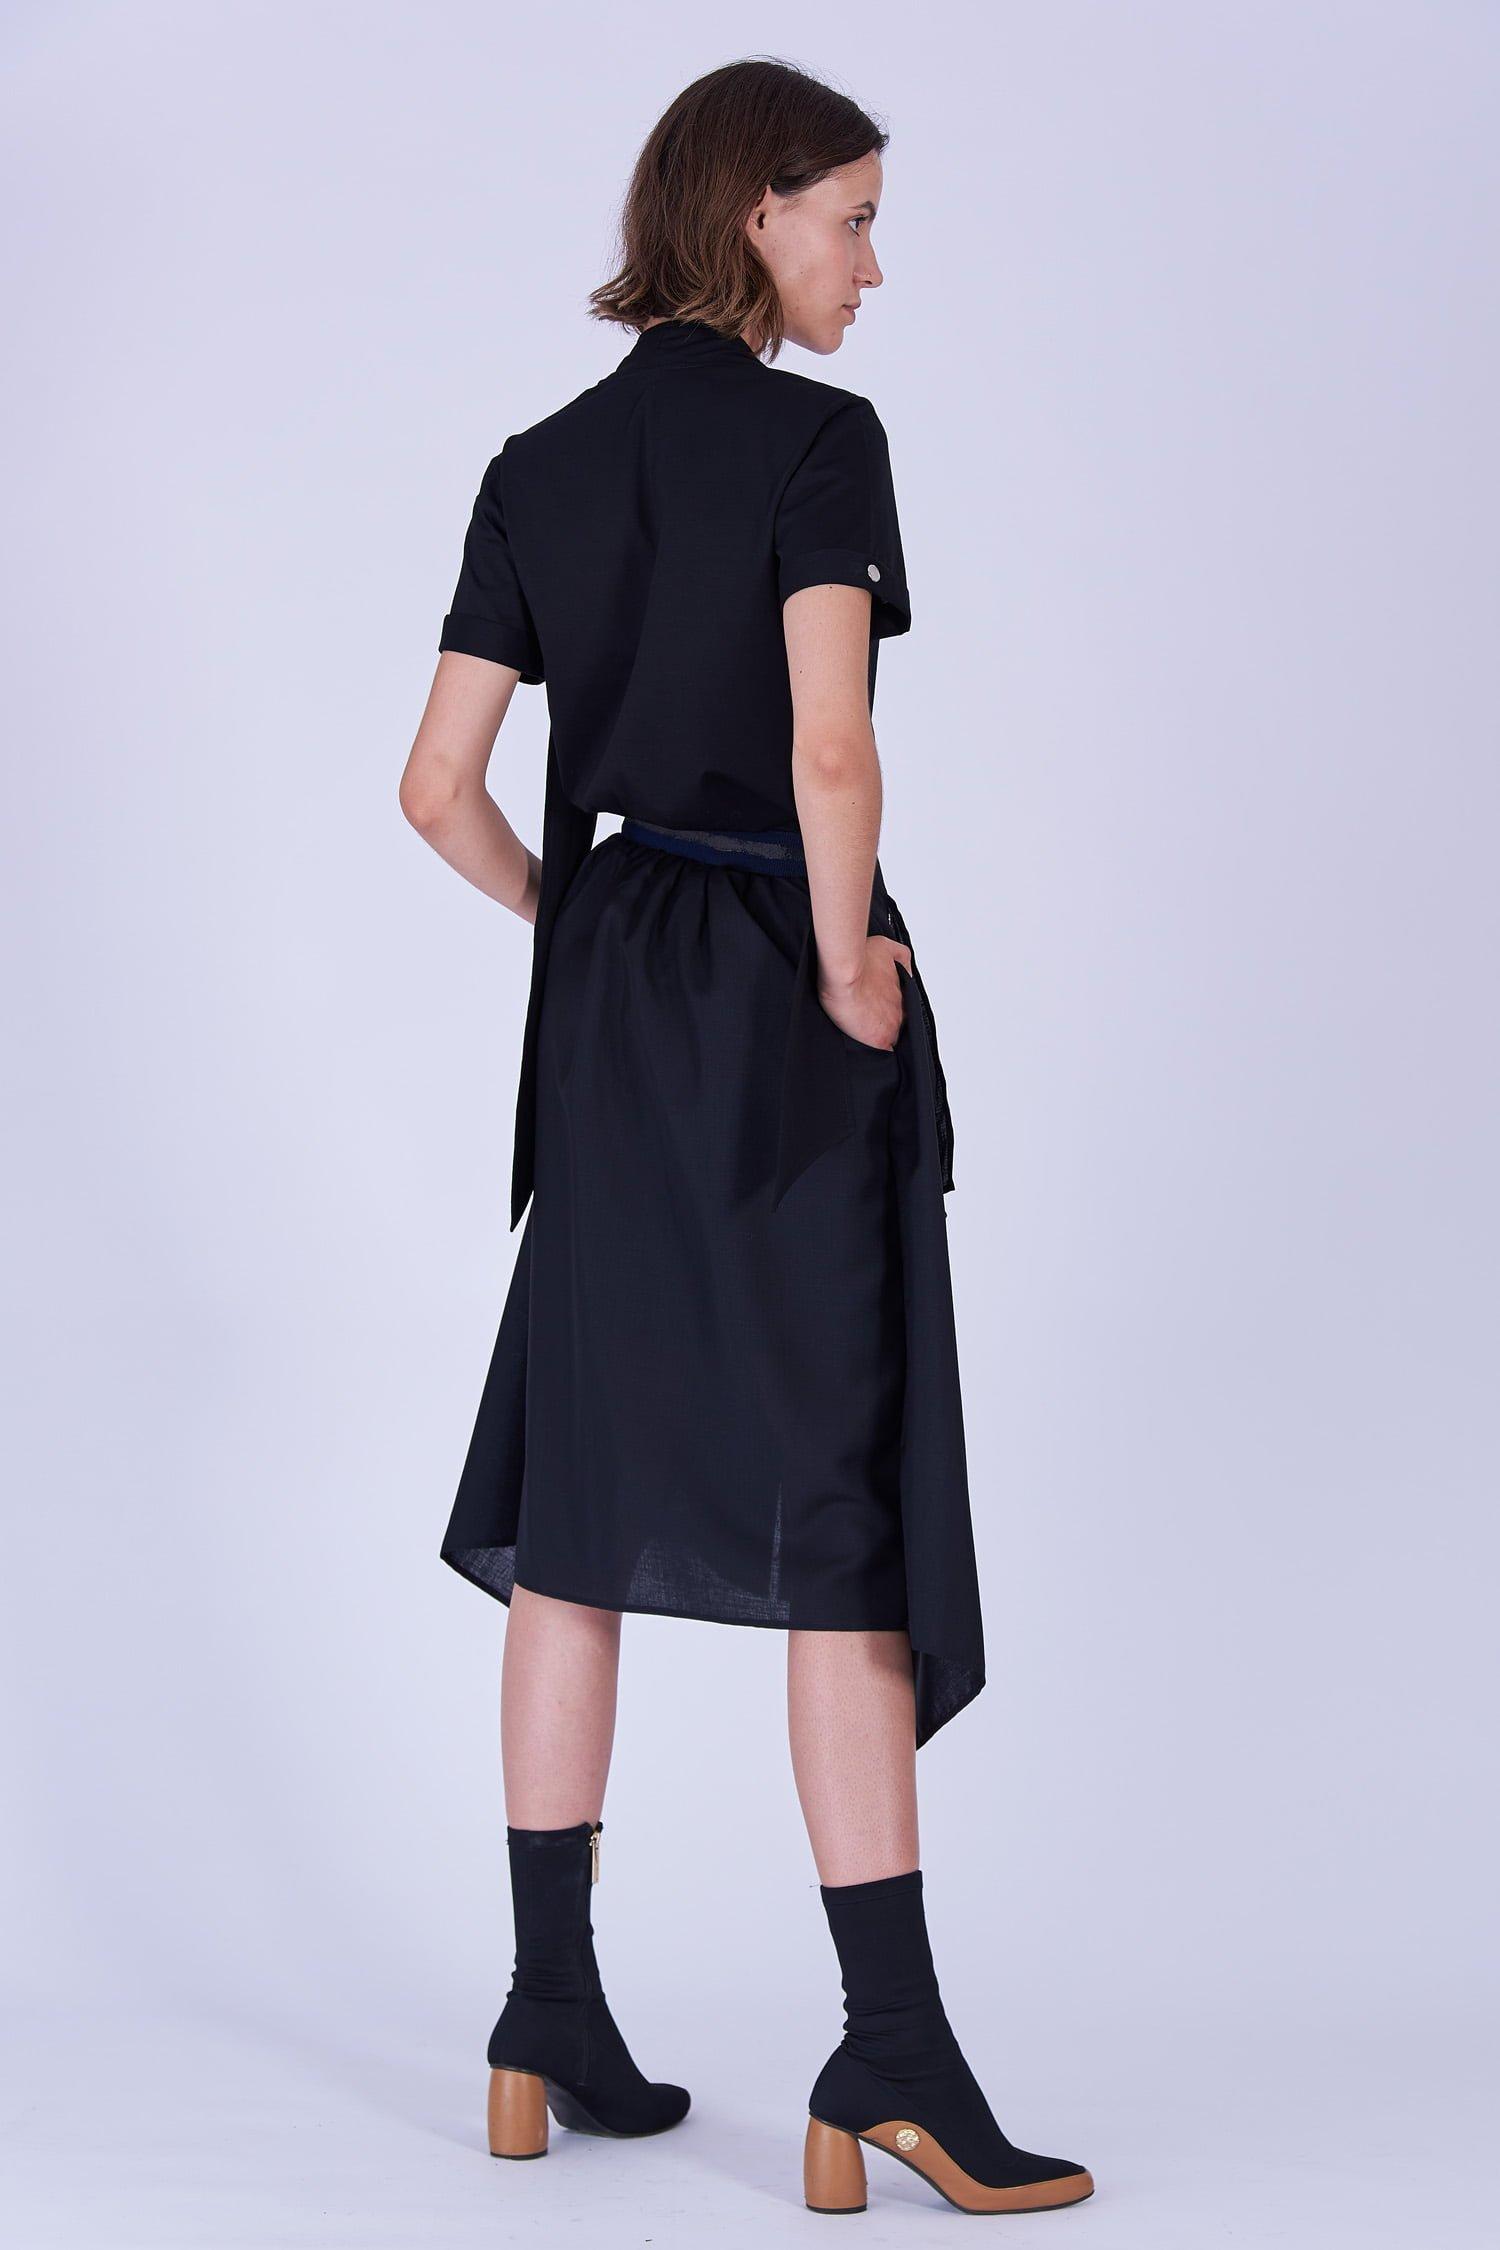 Acephala Fw19 20 Black Skirt Draped Czarna Spodnica Drapowana Back